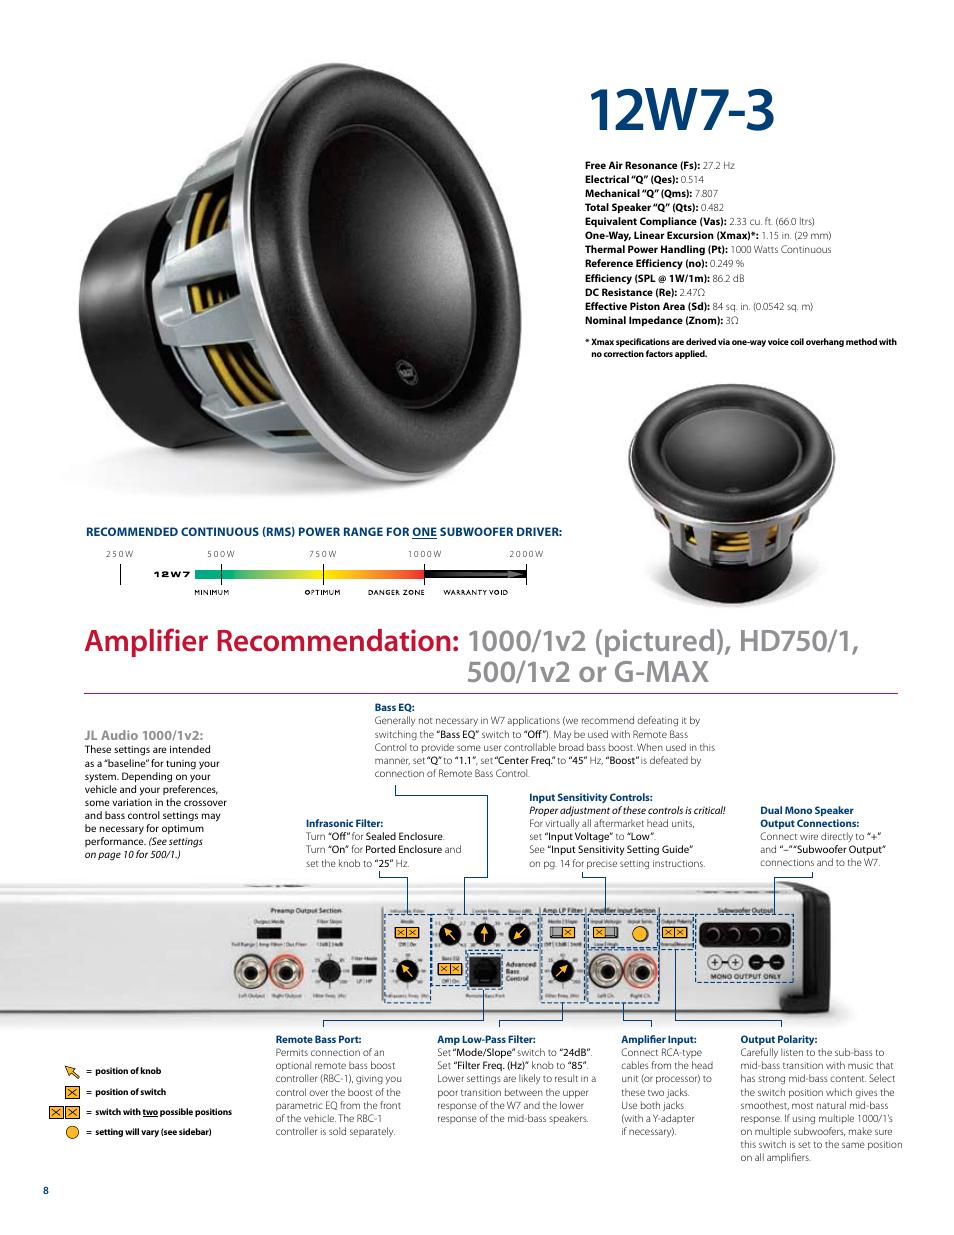 12w7 3 jl audio w7 user manual page 8 16 rh manualsdir com JL Audio 12In Subwoofer 500W JL Audio 12In Subwoofer 500W